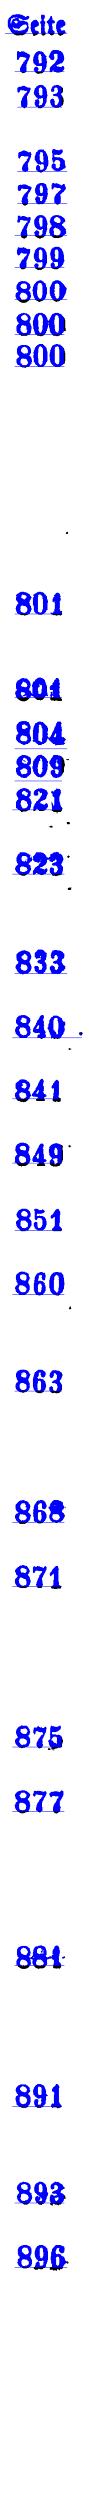 [merged small][merged small][ocr errors][merged small][ocr errors][ocr errors][ocr errors][ocr errors][ocr errors][ocr errors][ocr errors][ocr errors]